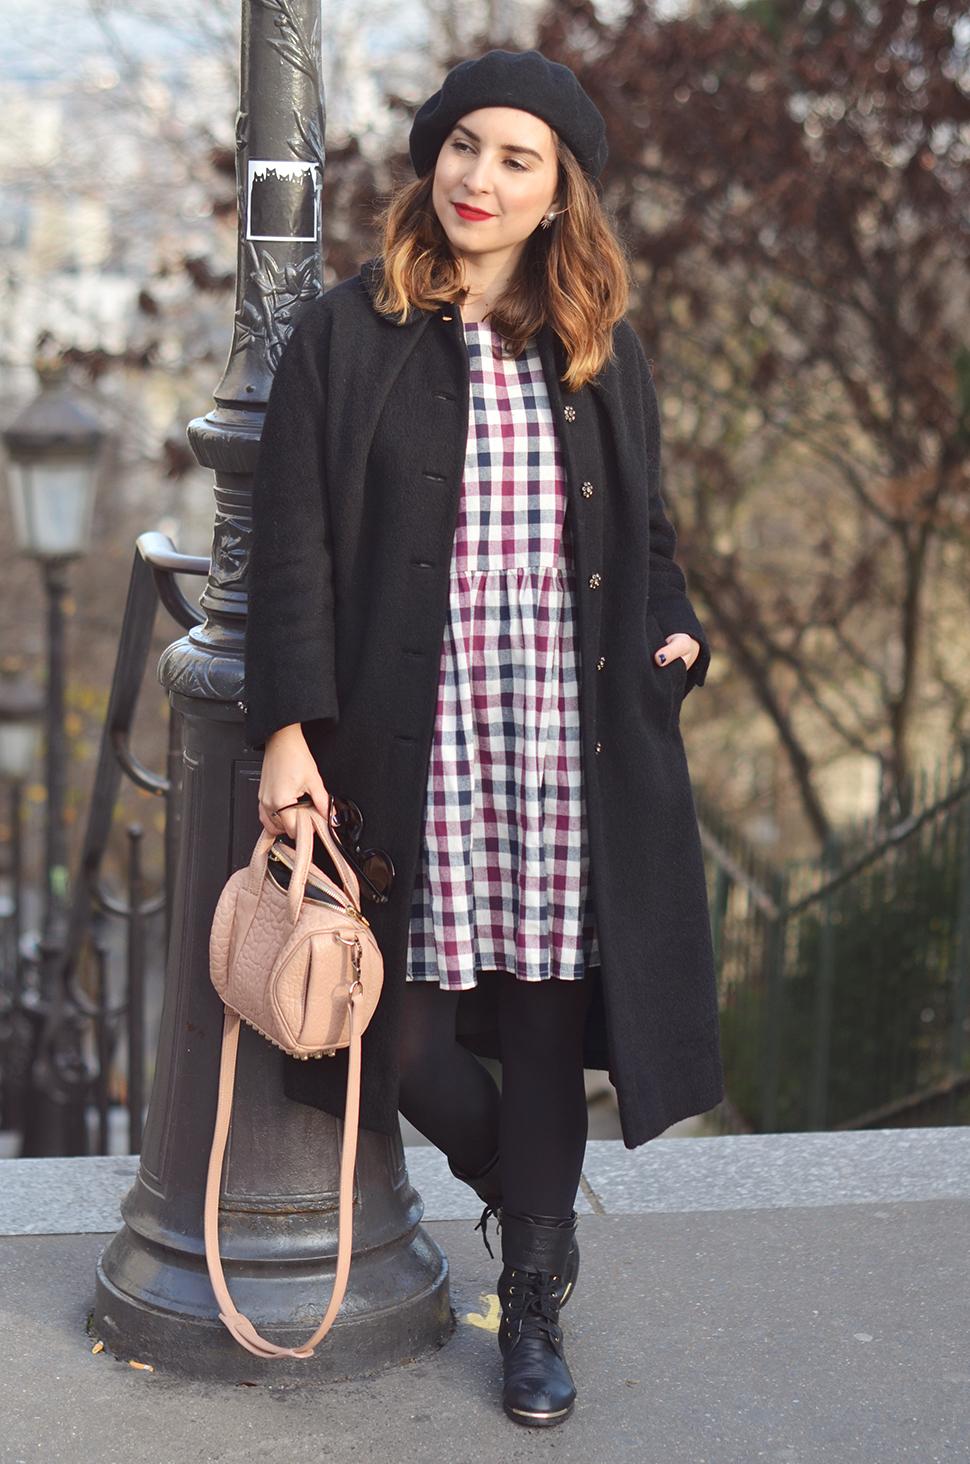 Helloitsvalentine_Montmartre_5